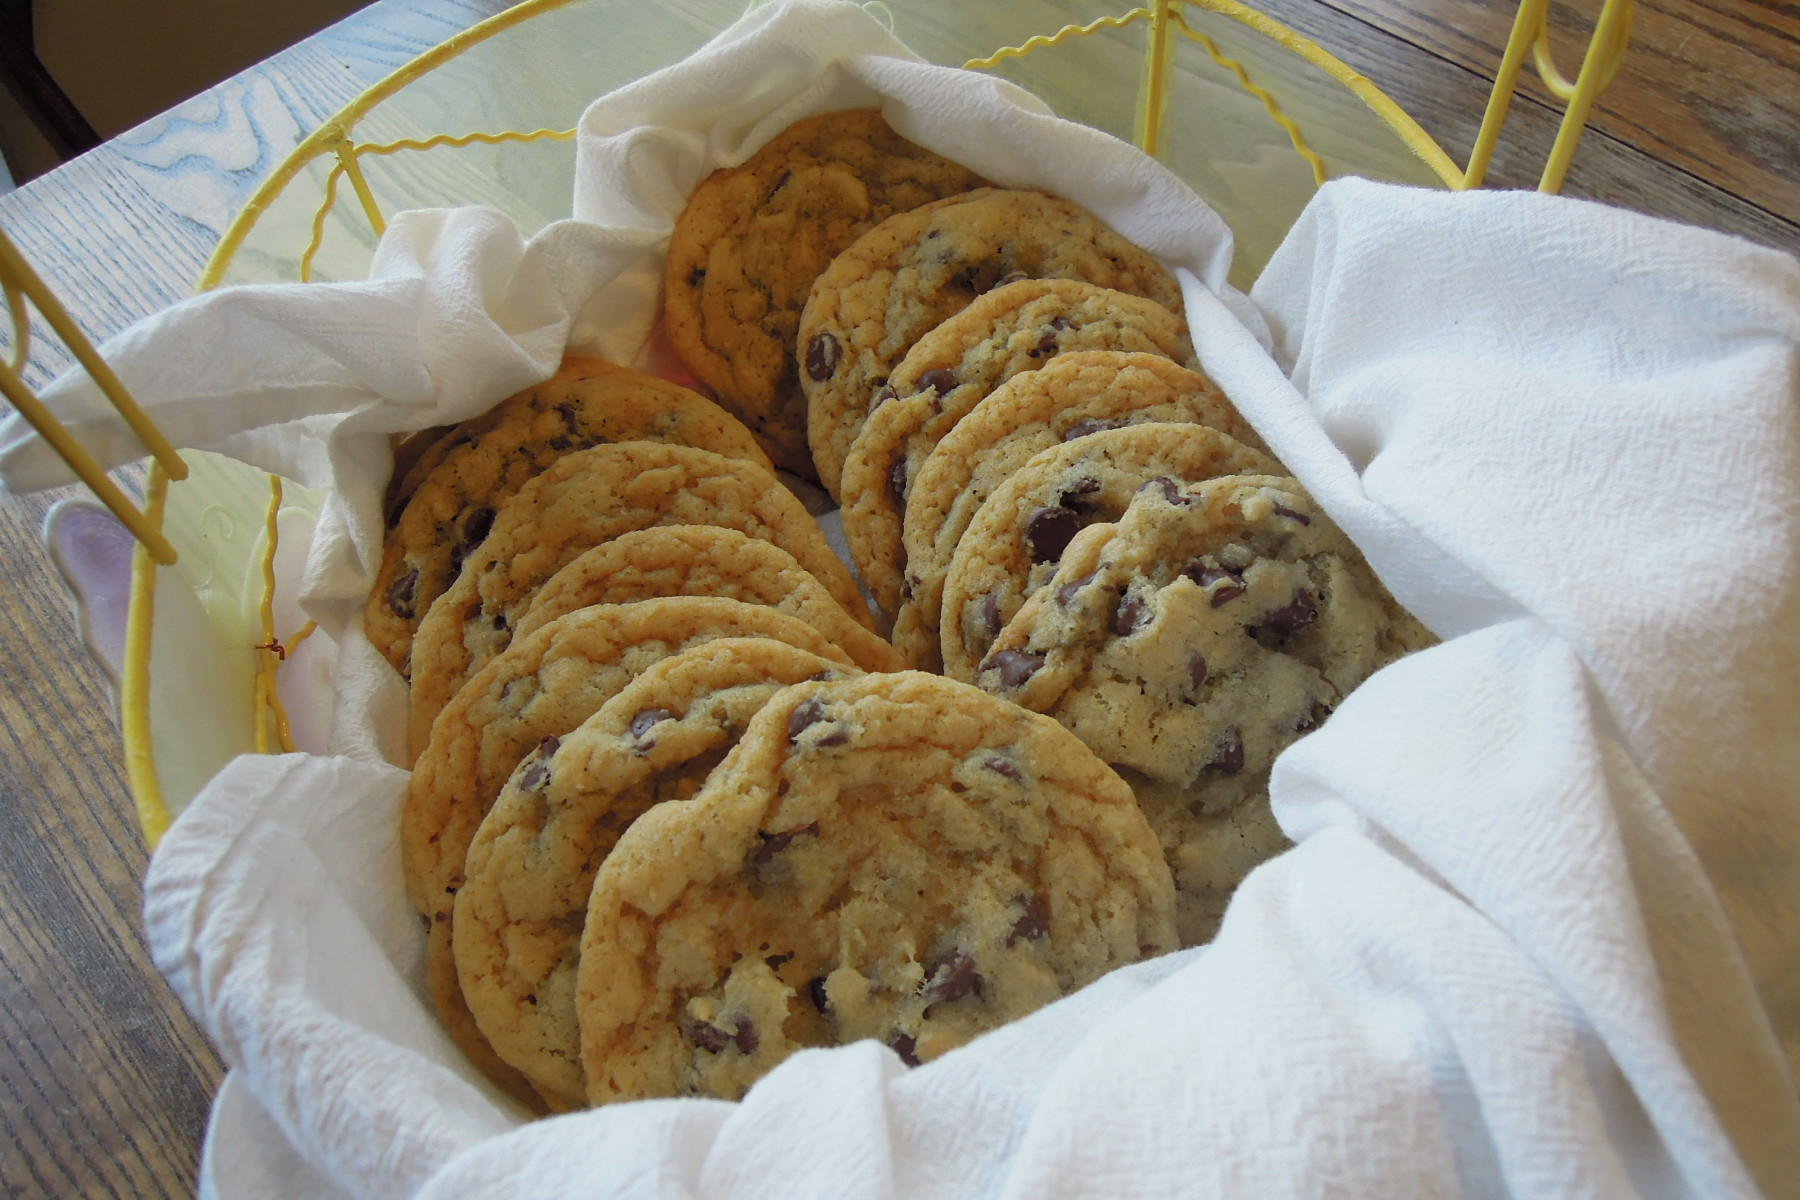 Christine's Soft Chocolate Chip Cookies